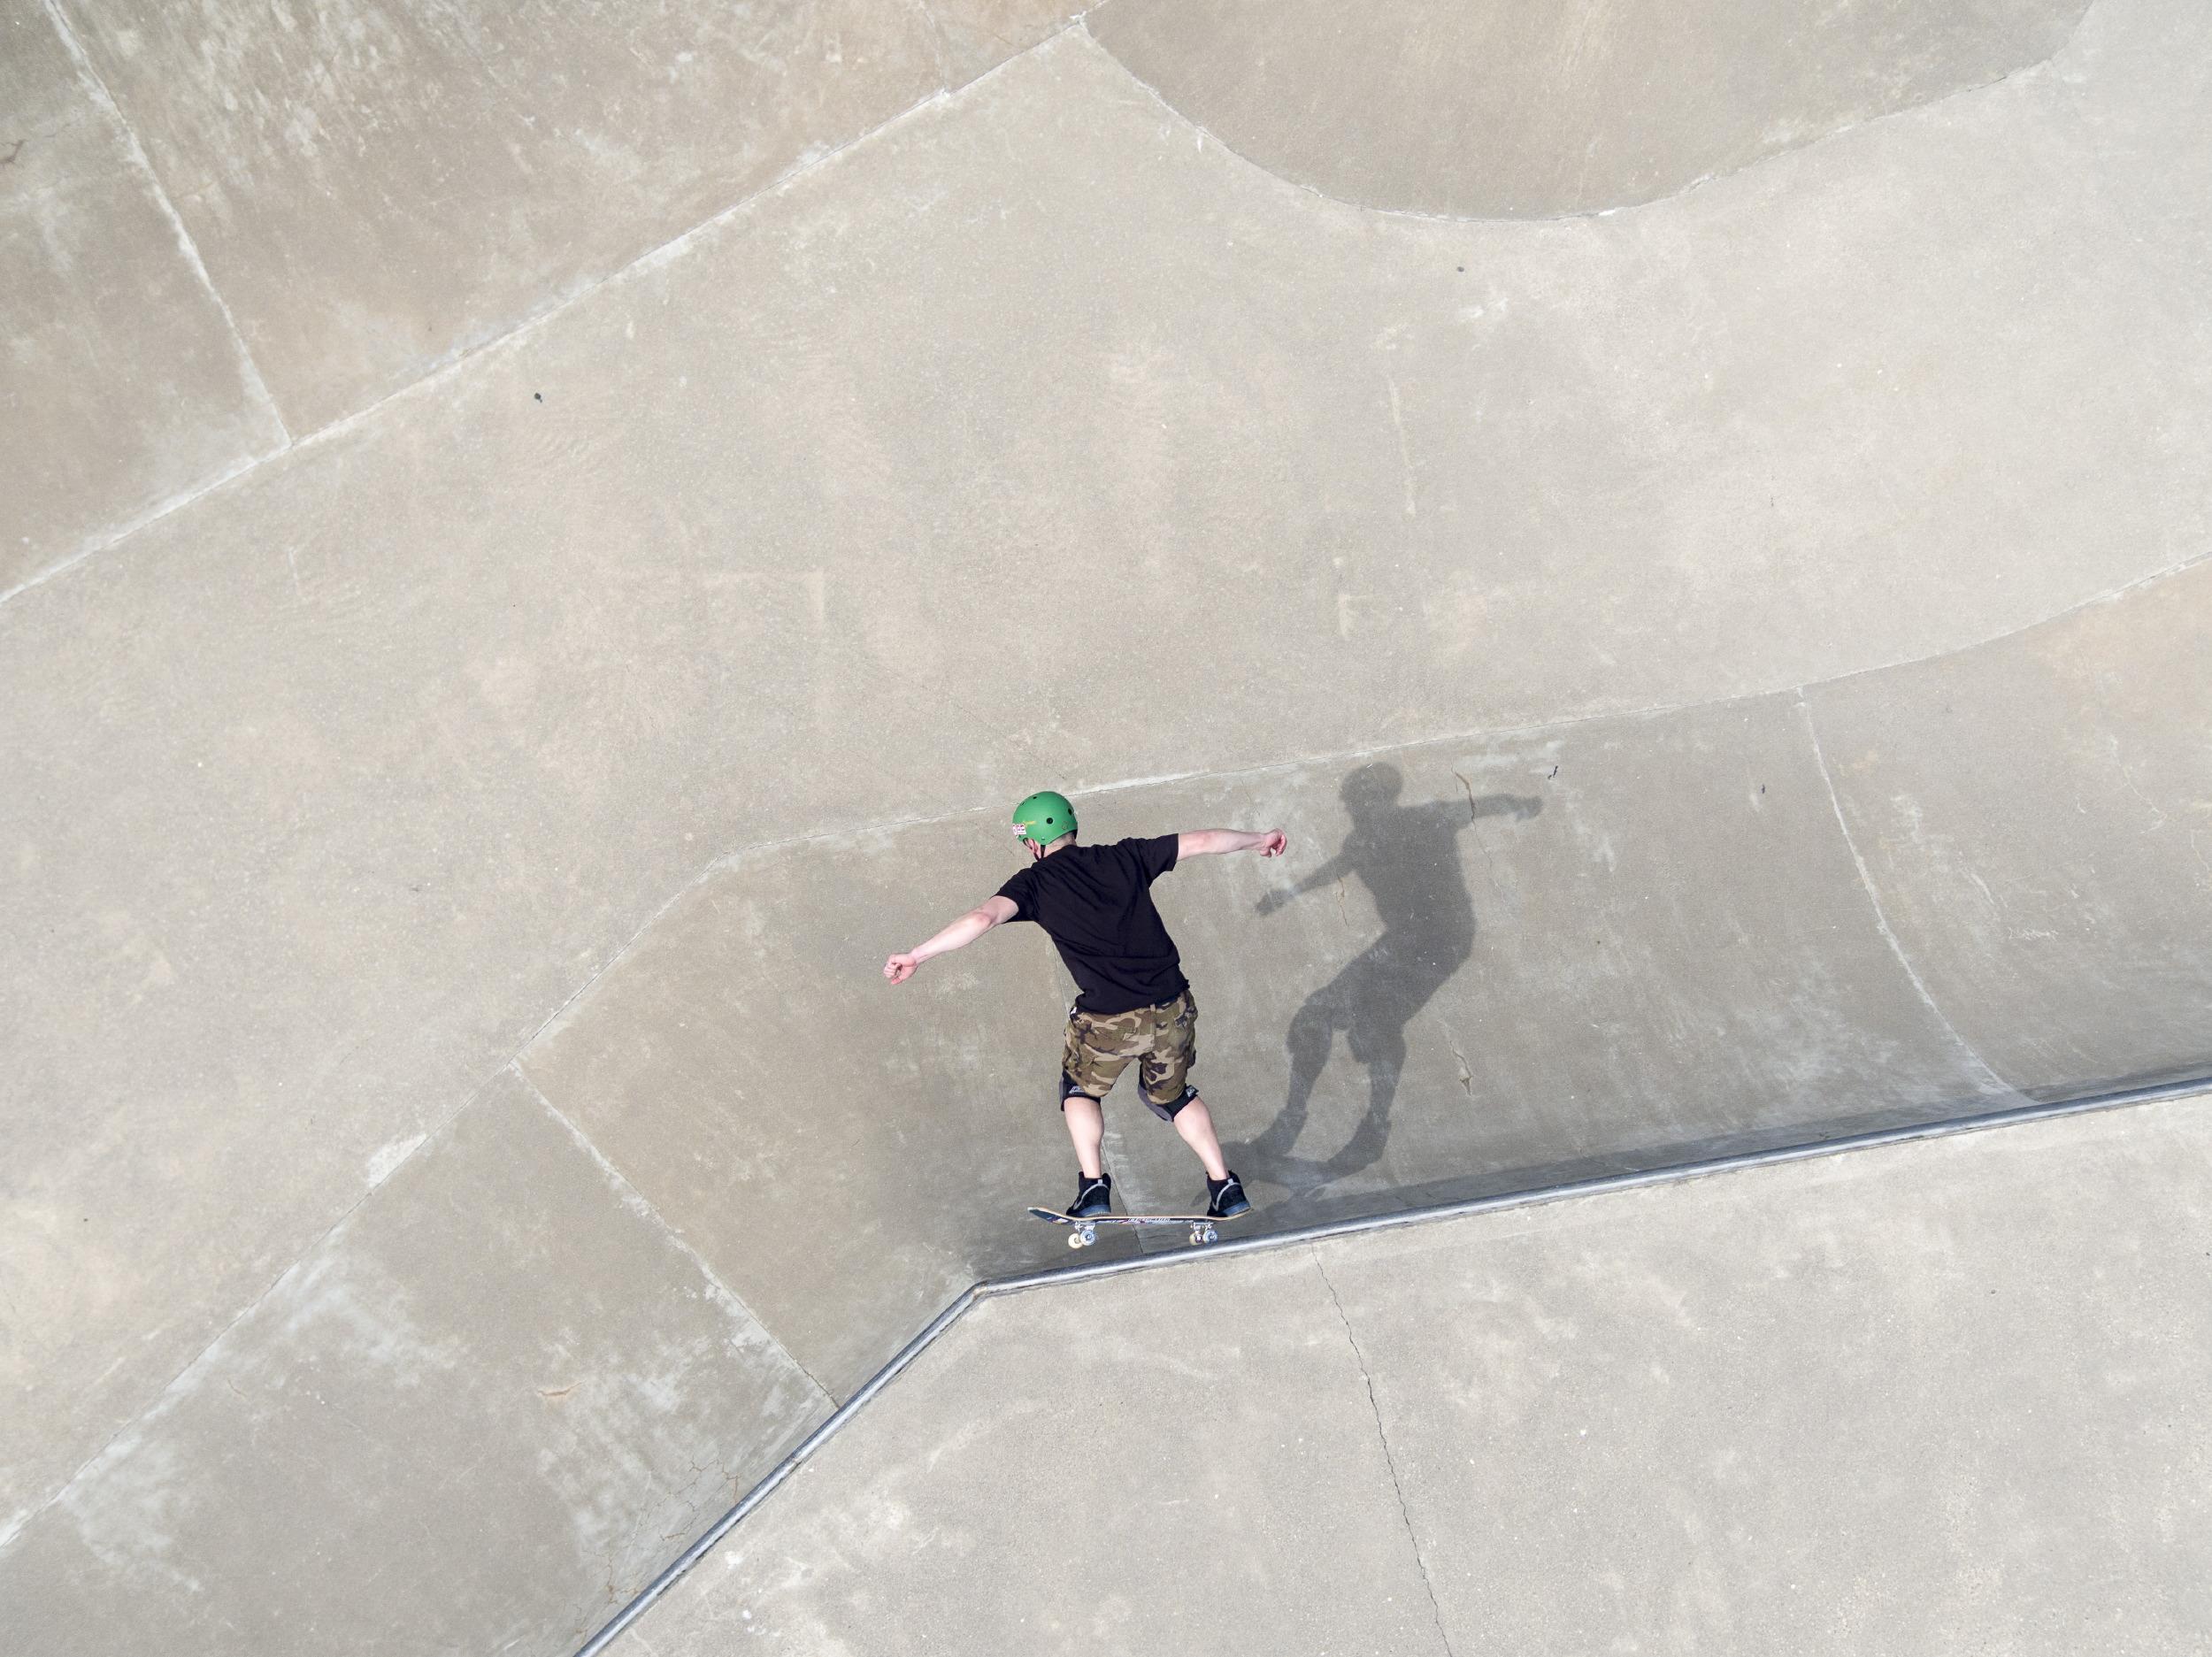 Skateboarding CEO for Inc. Magazine